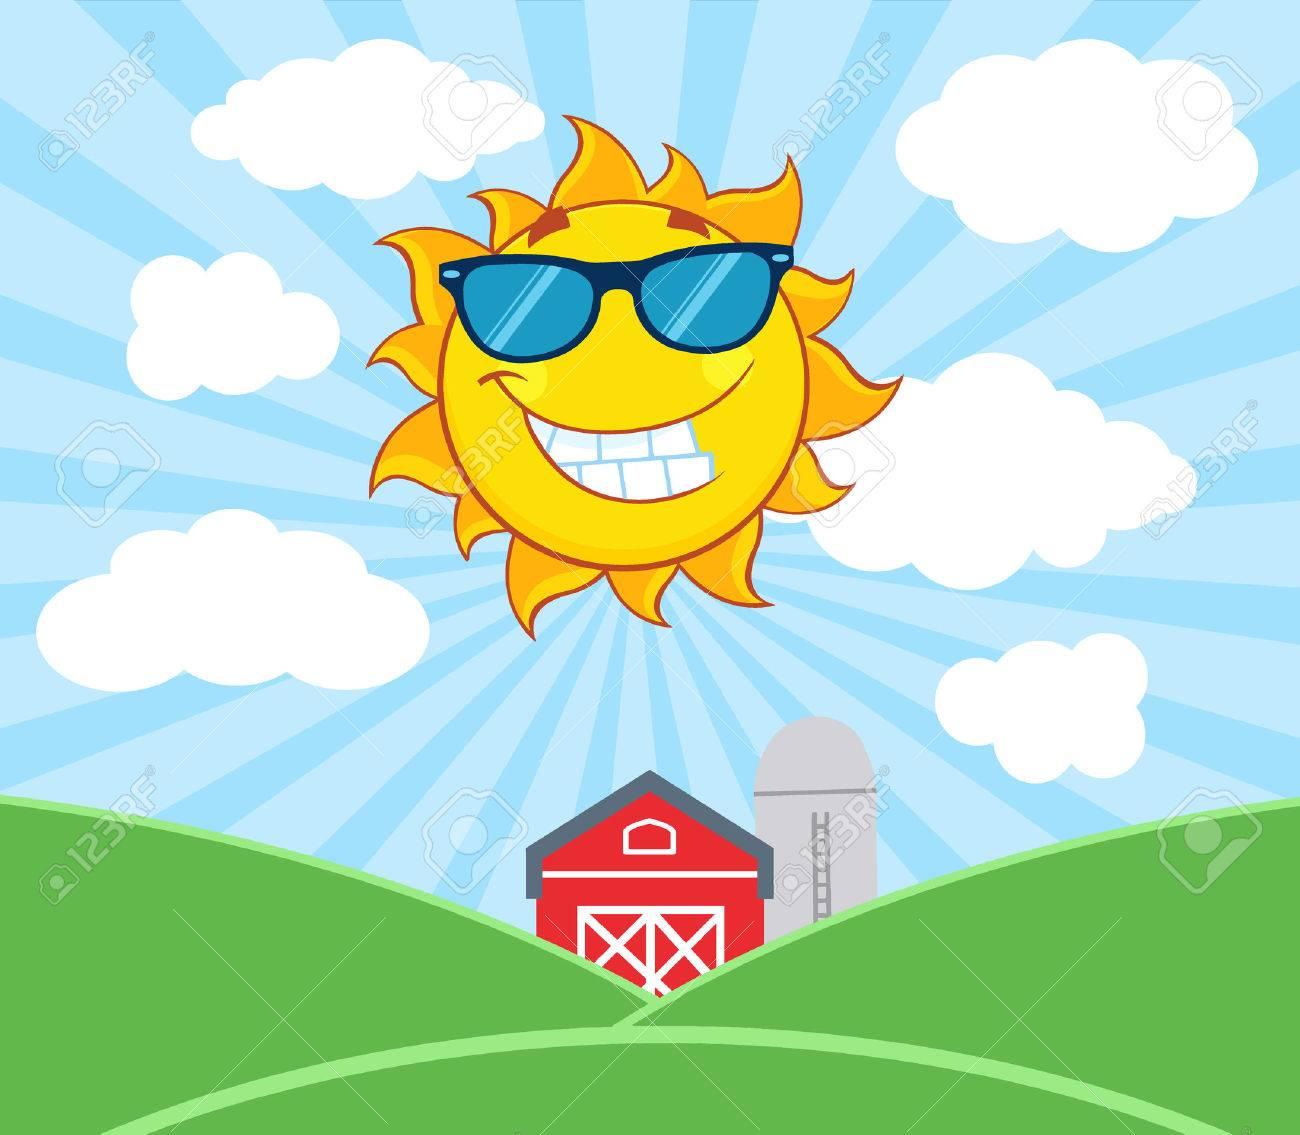 smiling sun mascot cartoon character with sunglasses illustration